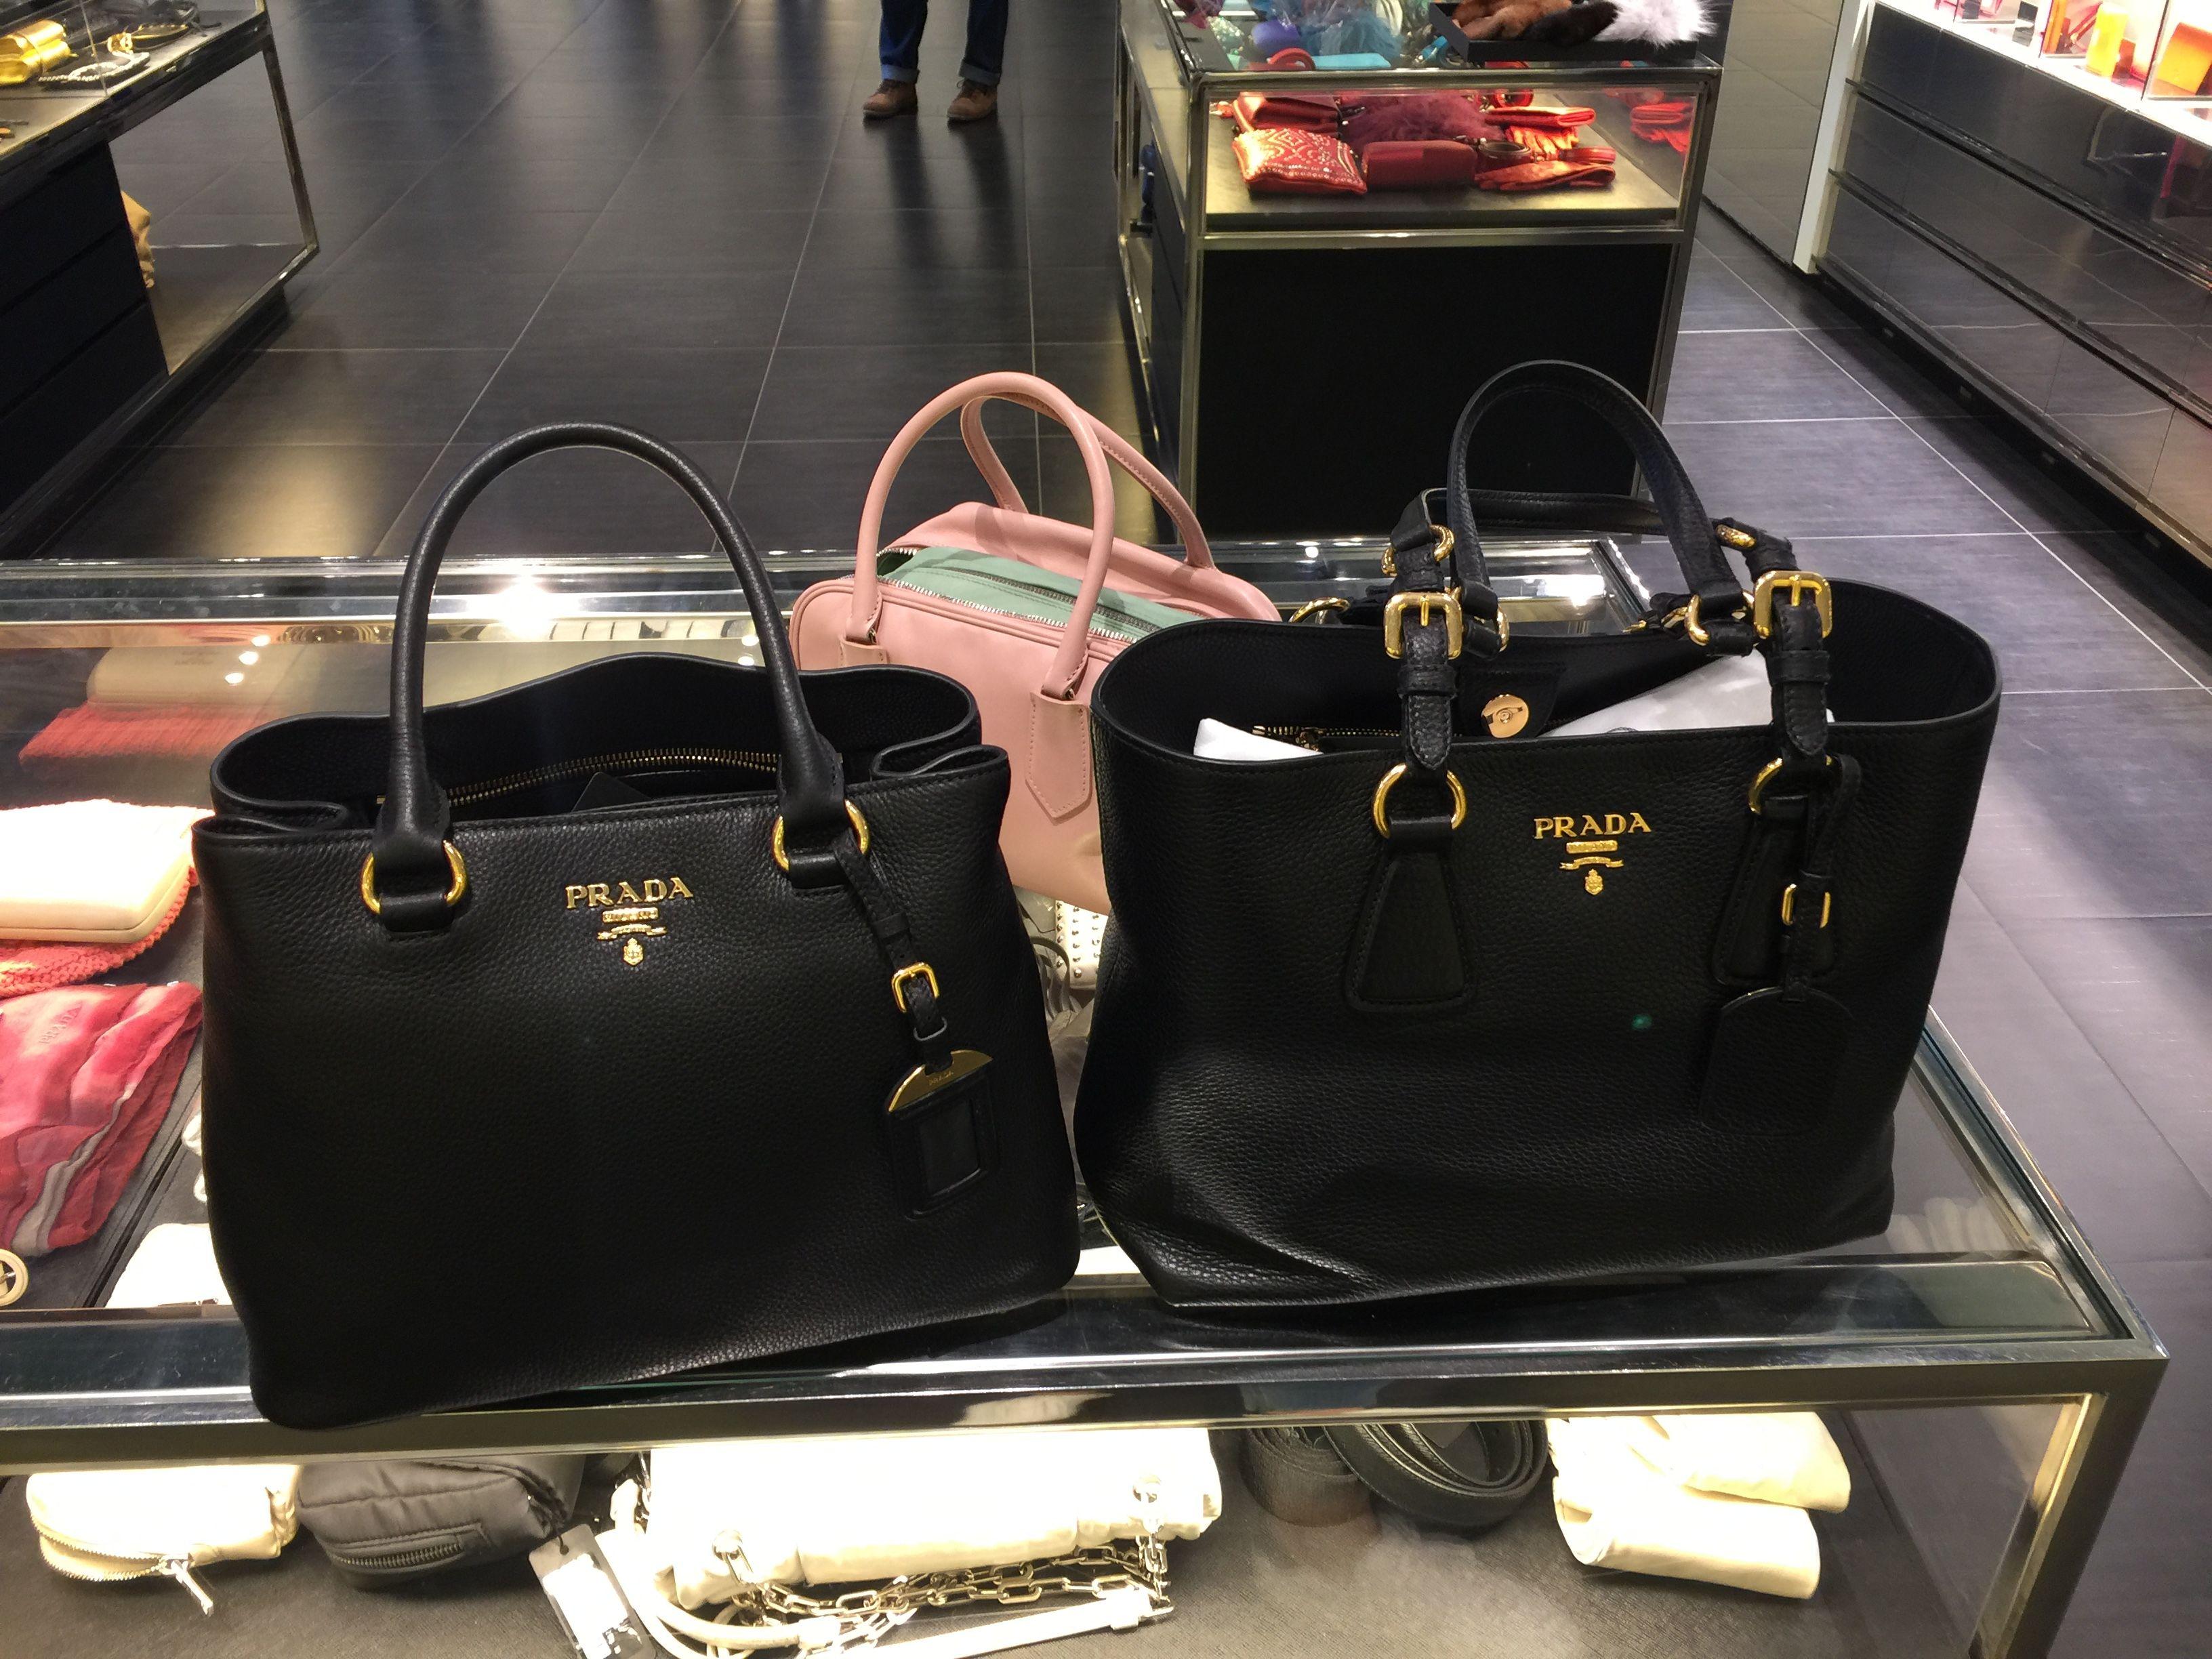 943ba7df9610 Prada bag New available on eBay $1095 (left one) & $1085 Free complimentary  shipping ( 1BG043 & 1BA058)